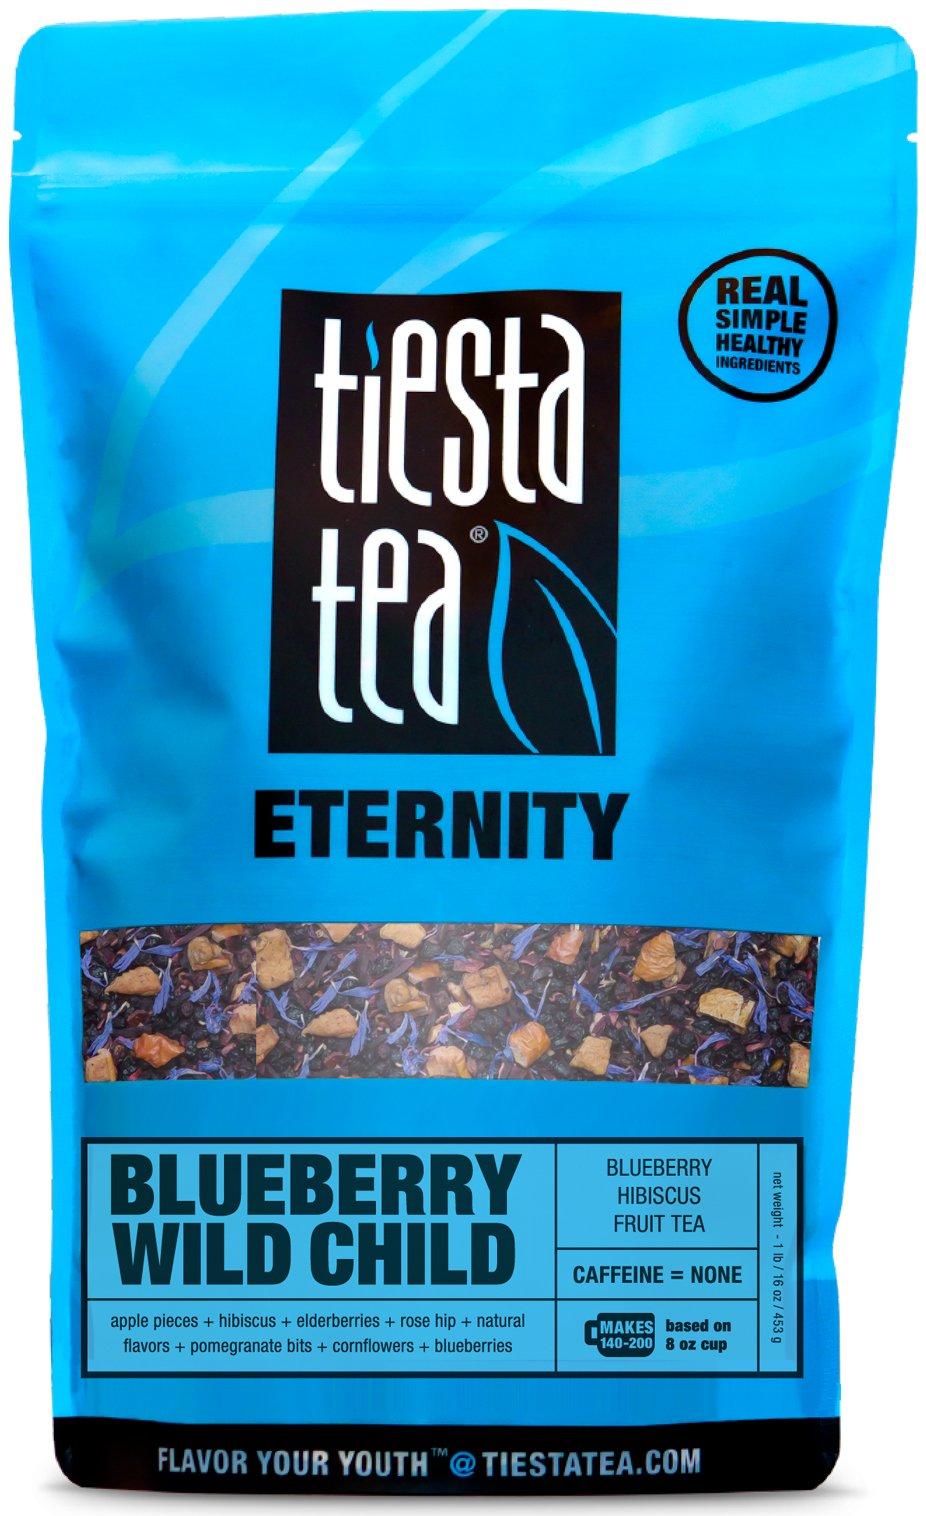 Tiesta Tea Blueberry Wild Child Blueberry Hibiscus Fruit Tea, 200 Servings, 1 Pound Bag - Caffeine Free, Loose Leaf Herbal Tea Eternity Blend, Non-GMO by Tiesta Tea